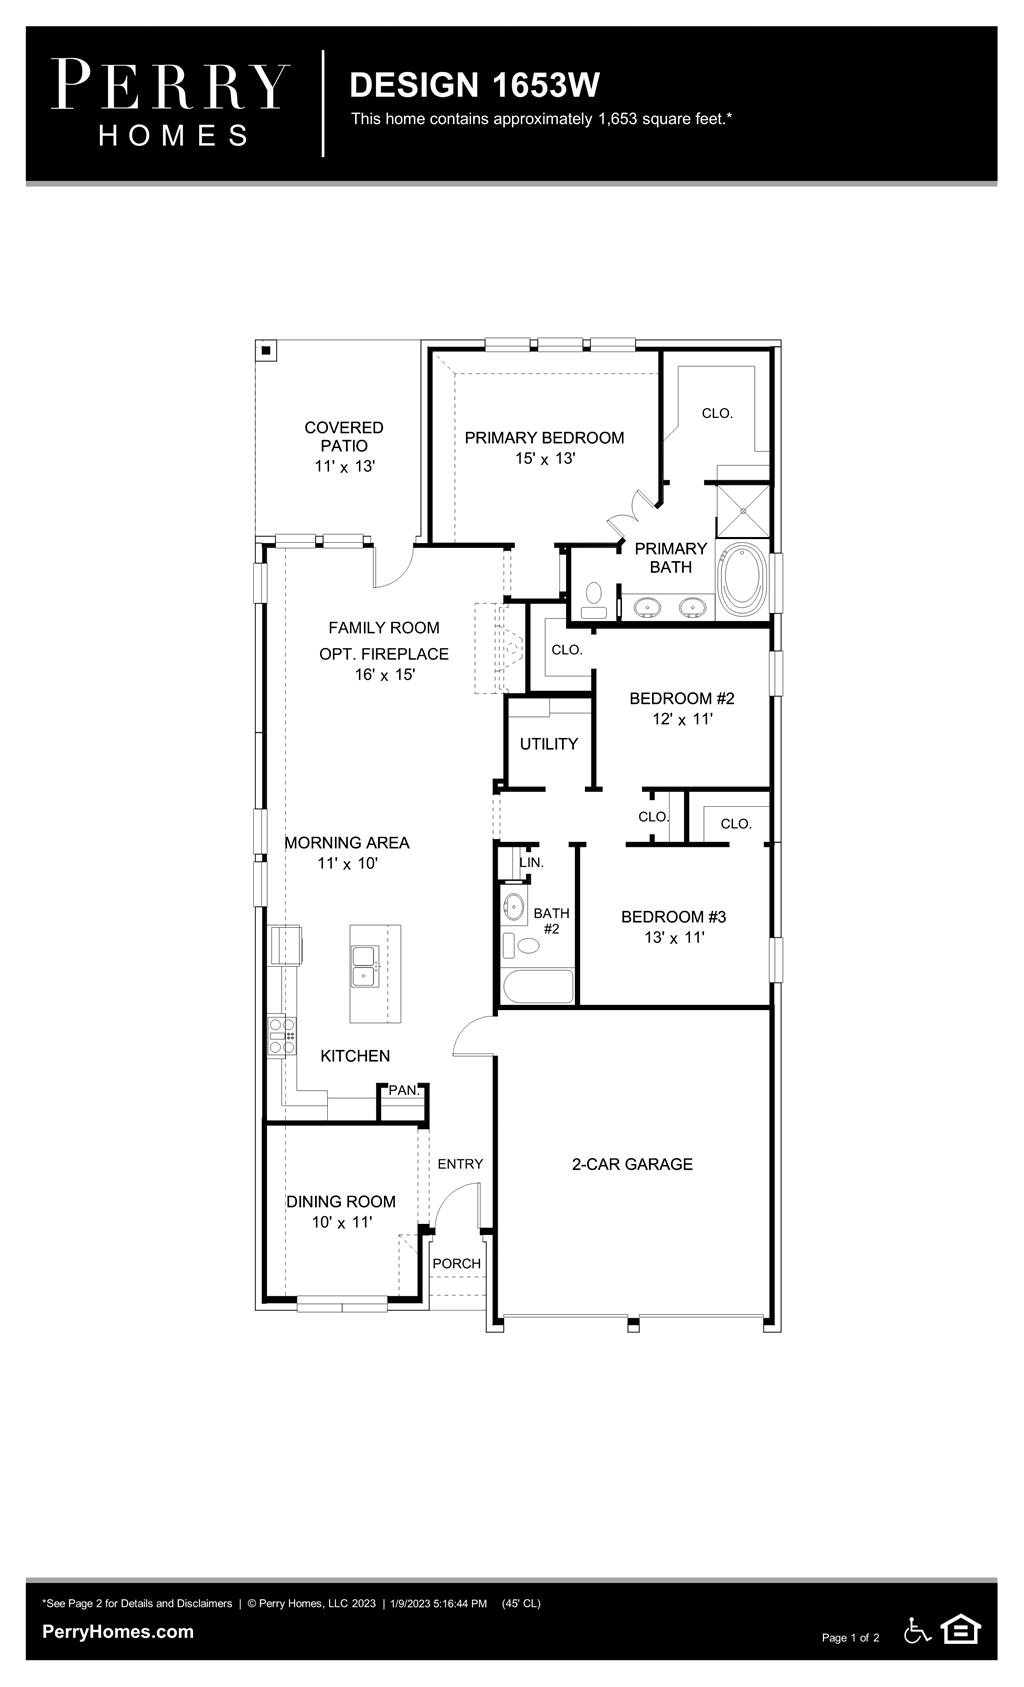 Floor Plan for 1653W